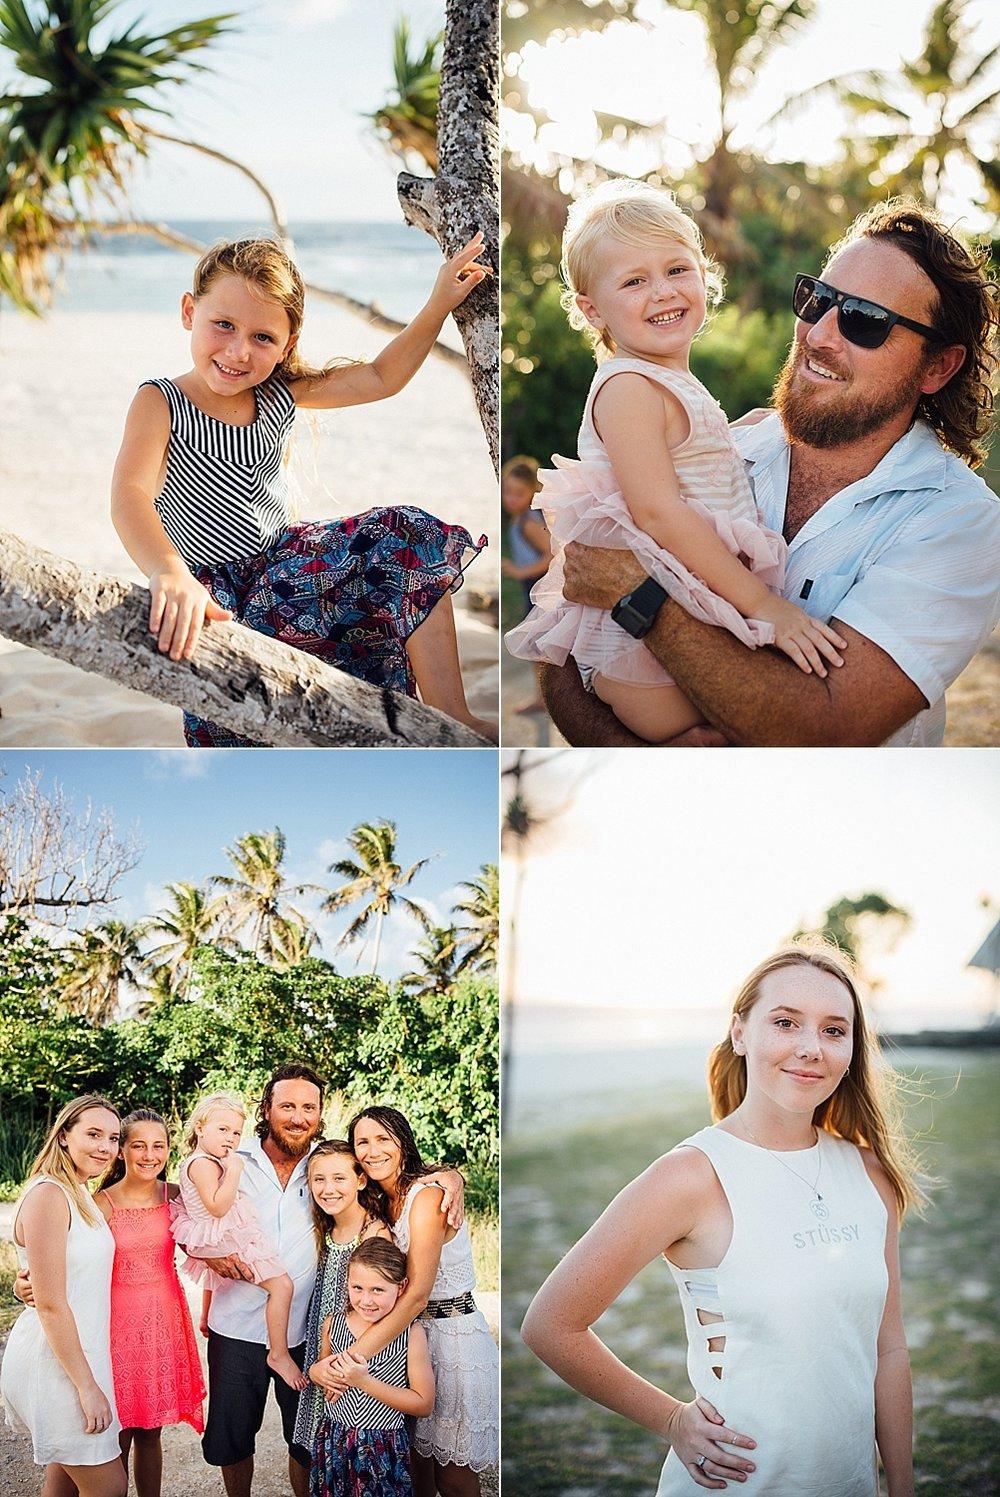 Jodie-FamilyPhotoshoot-PortVila-VillaChampagne-GroovyBanana-VanuatuPhotographers-Photography_0005--.jpg